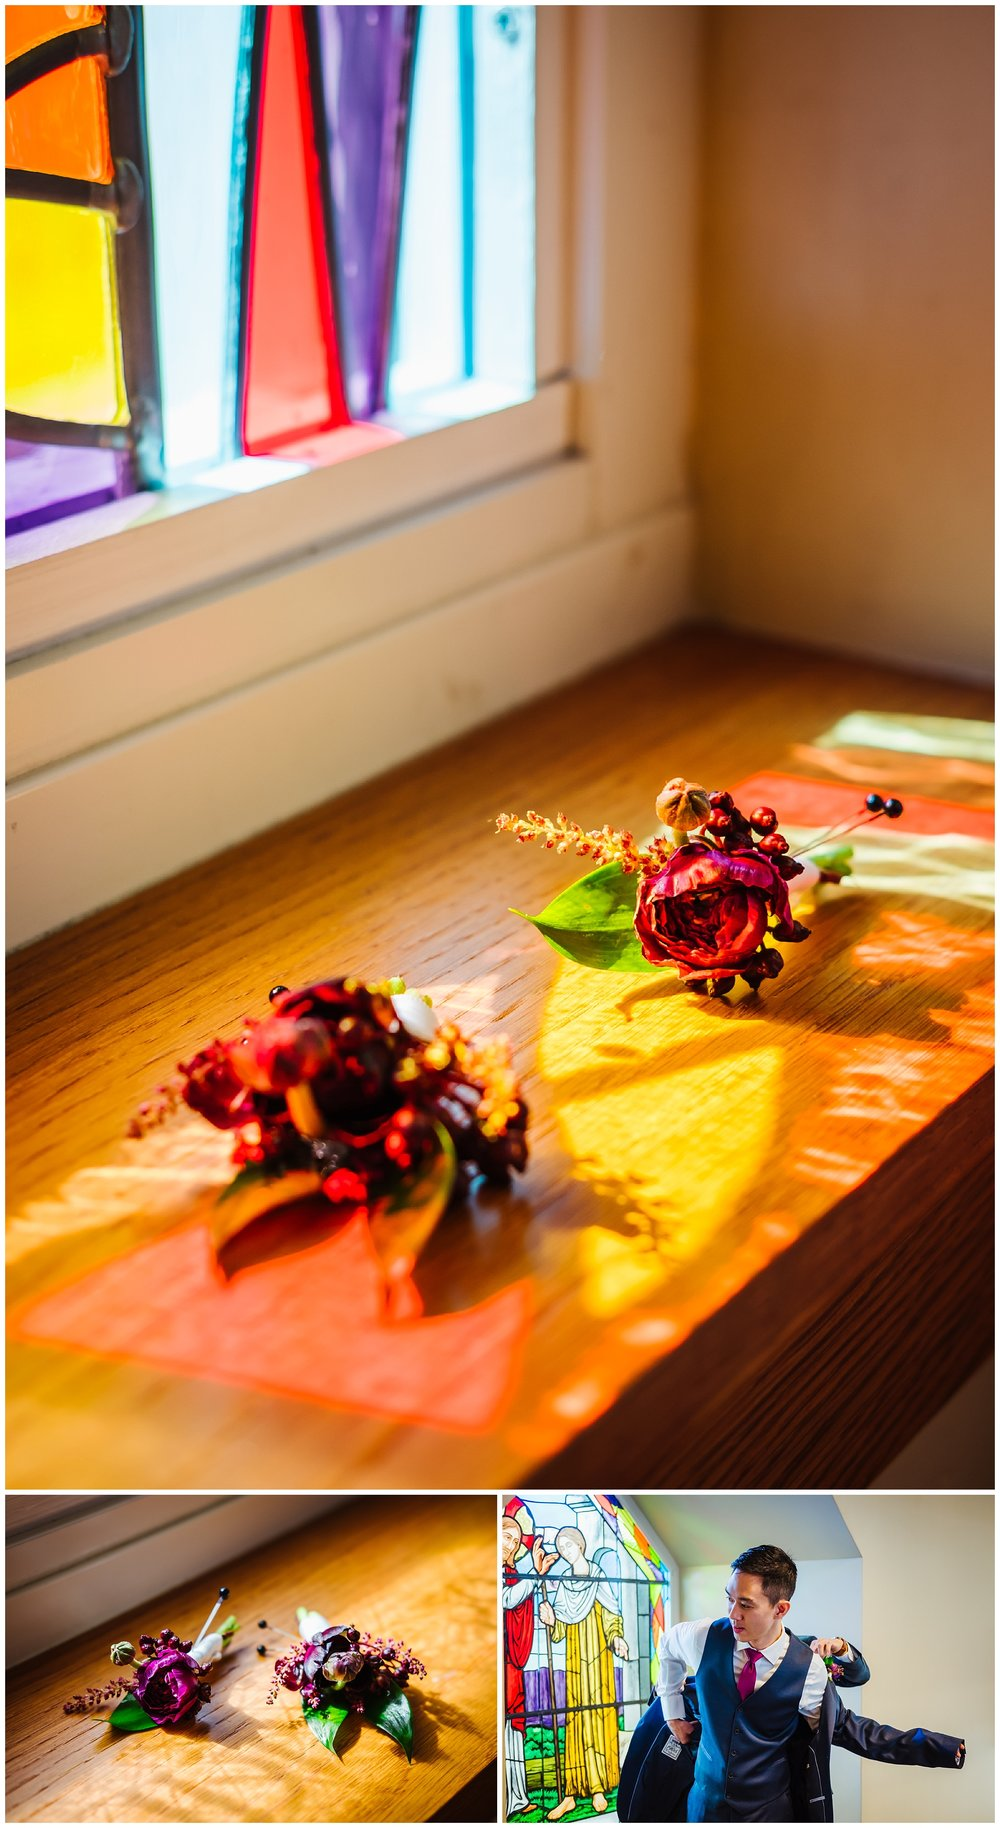 tampa-wedding-photographer-philipino-colorful-woods-ballroom-church-mass-confetti-fuscia_0020.jpg